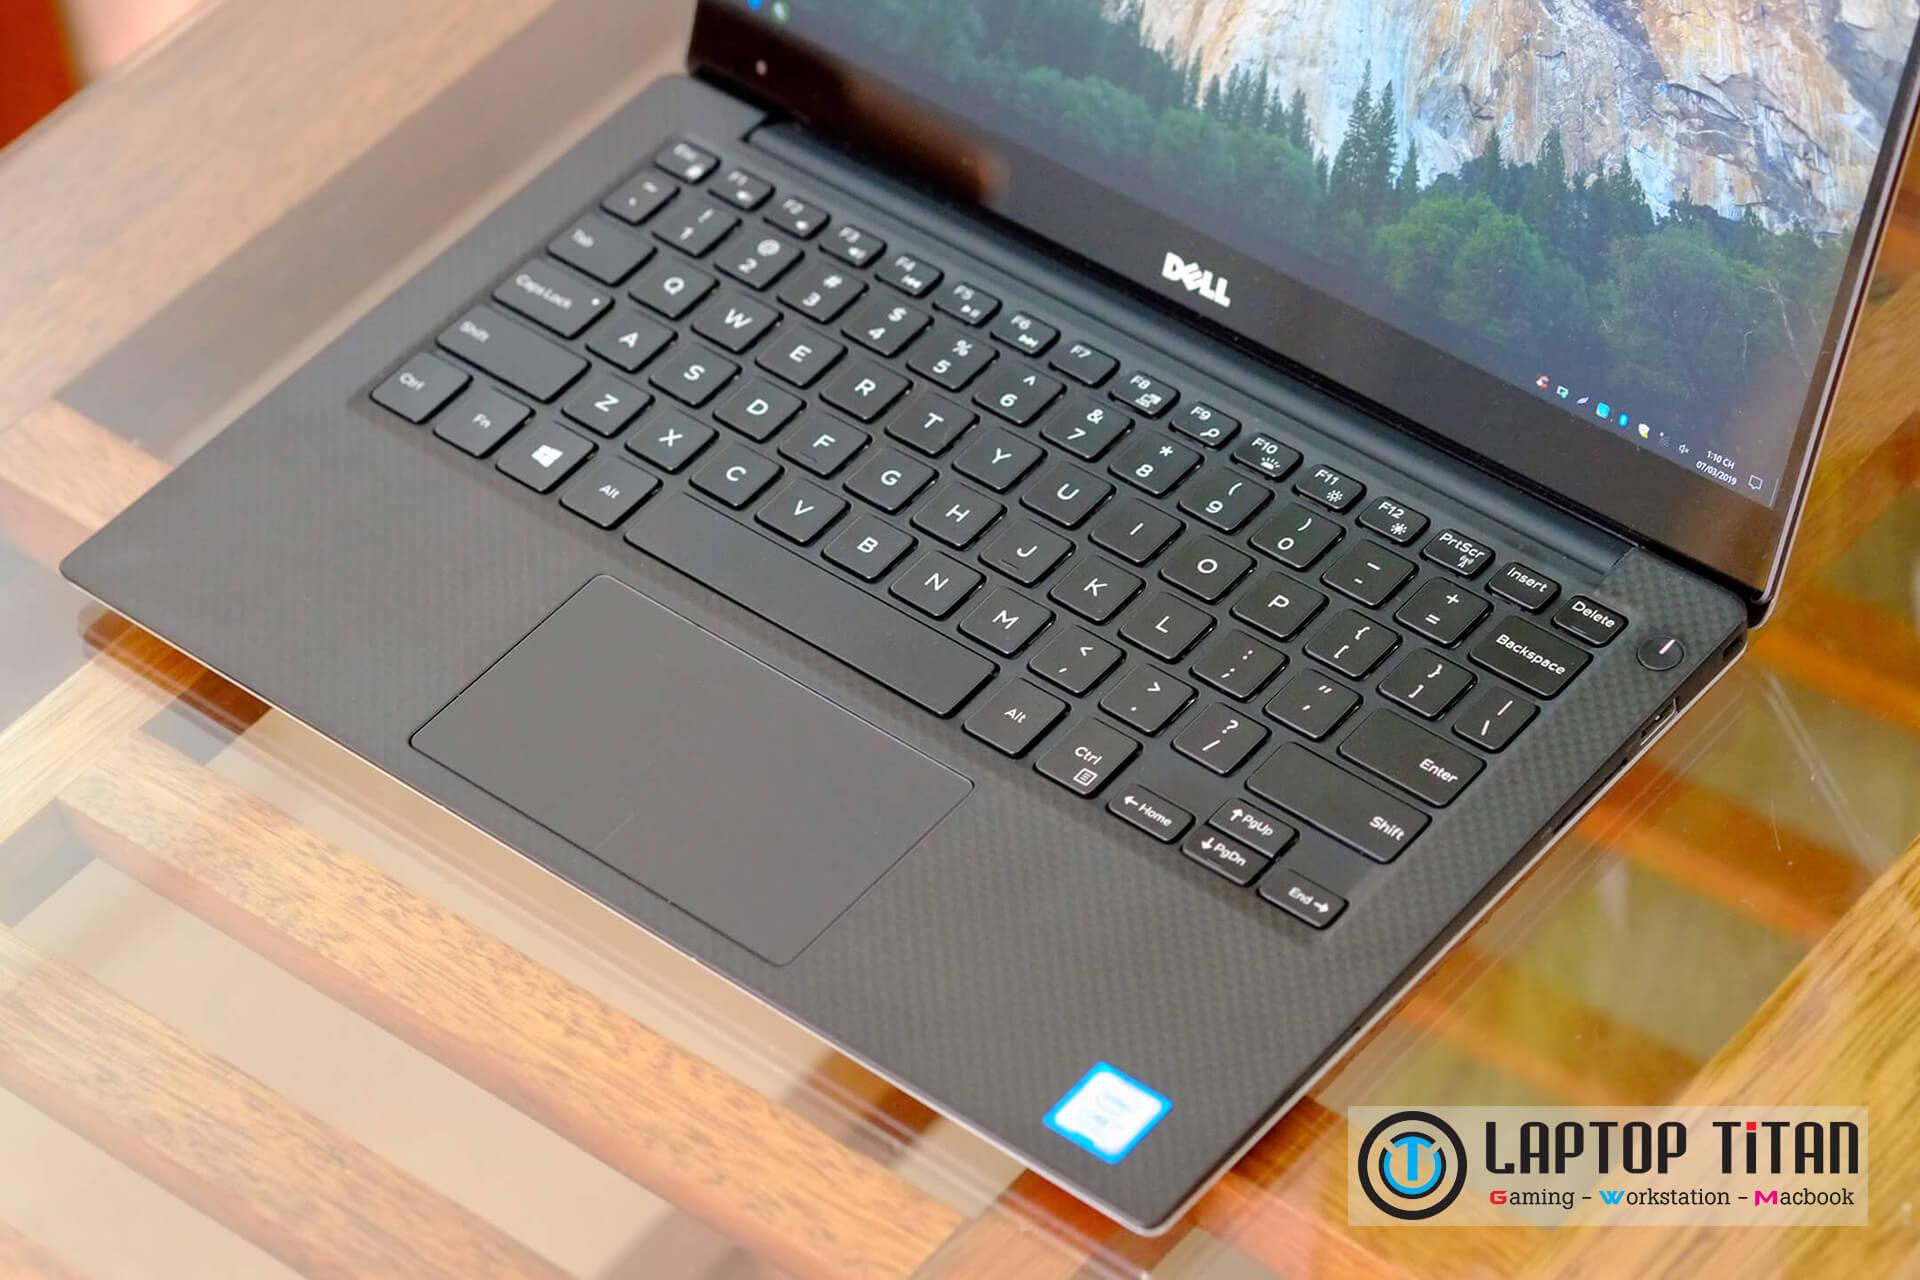 "Dell Xps 13 9360 Core i7 7560u / 8GB / 256GB / 13.3"" QHD Touch"